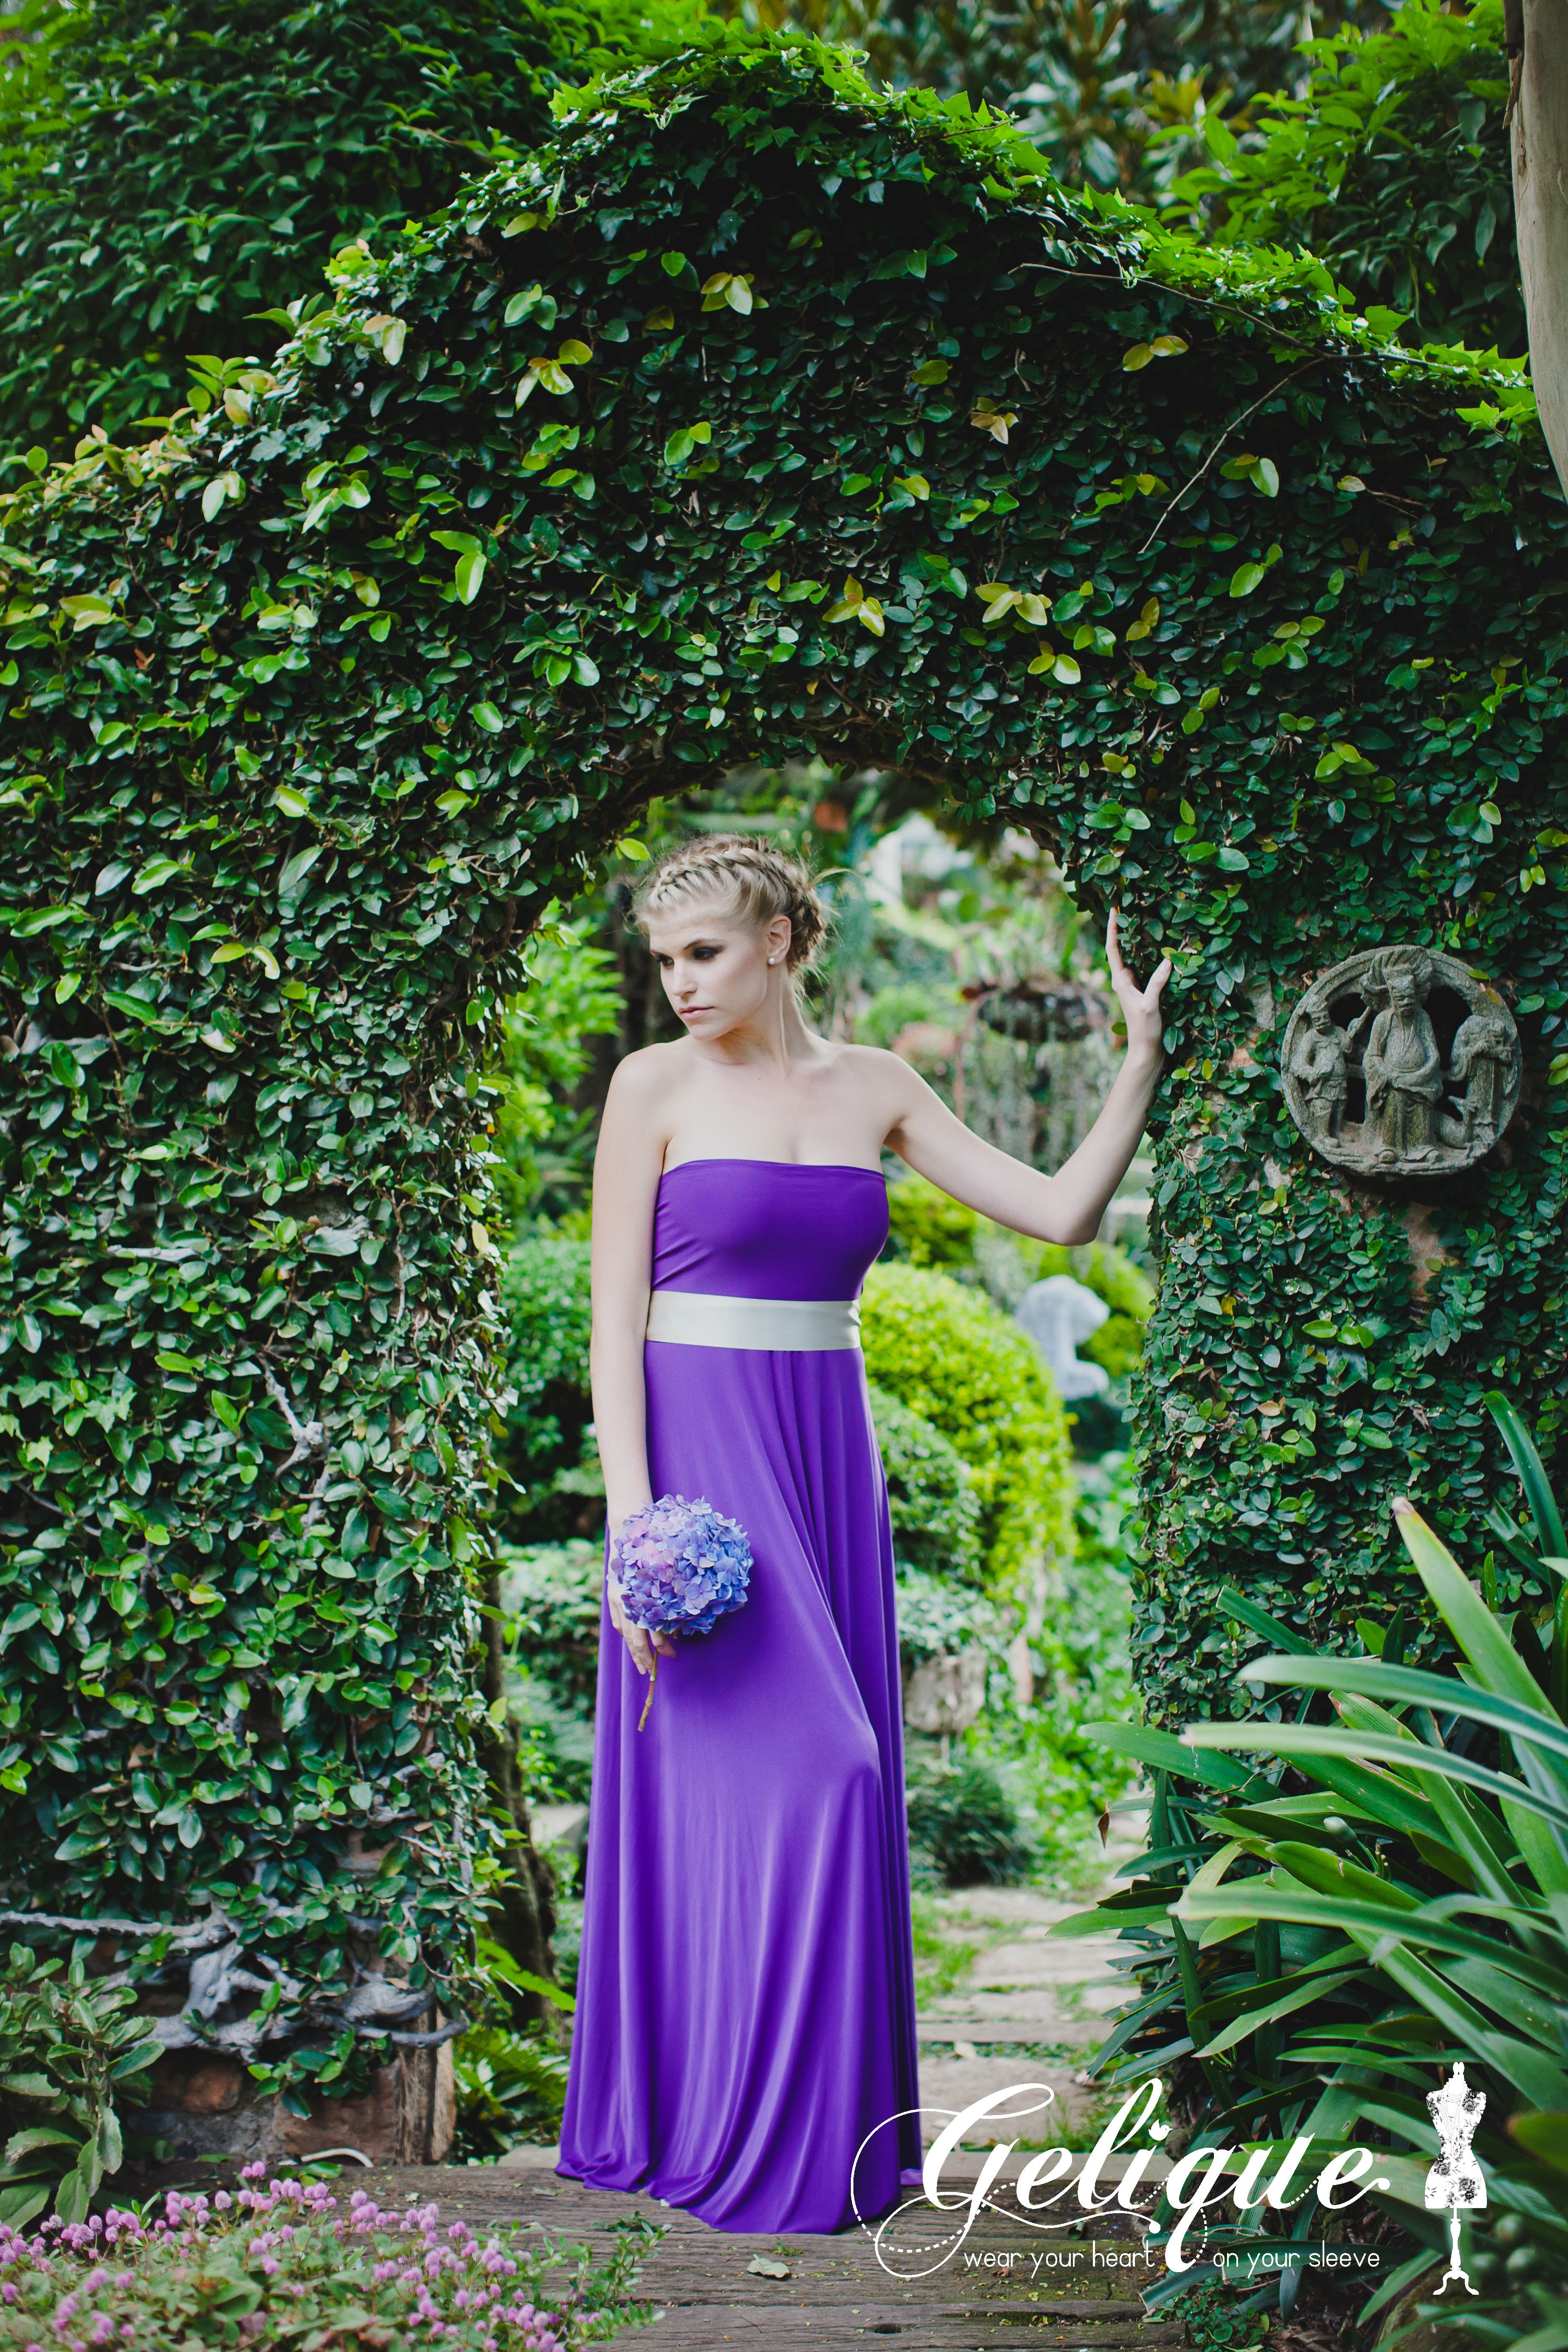 b67267fc232 Gelique Boobtube dress